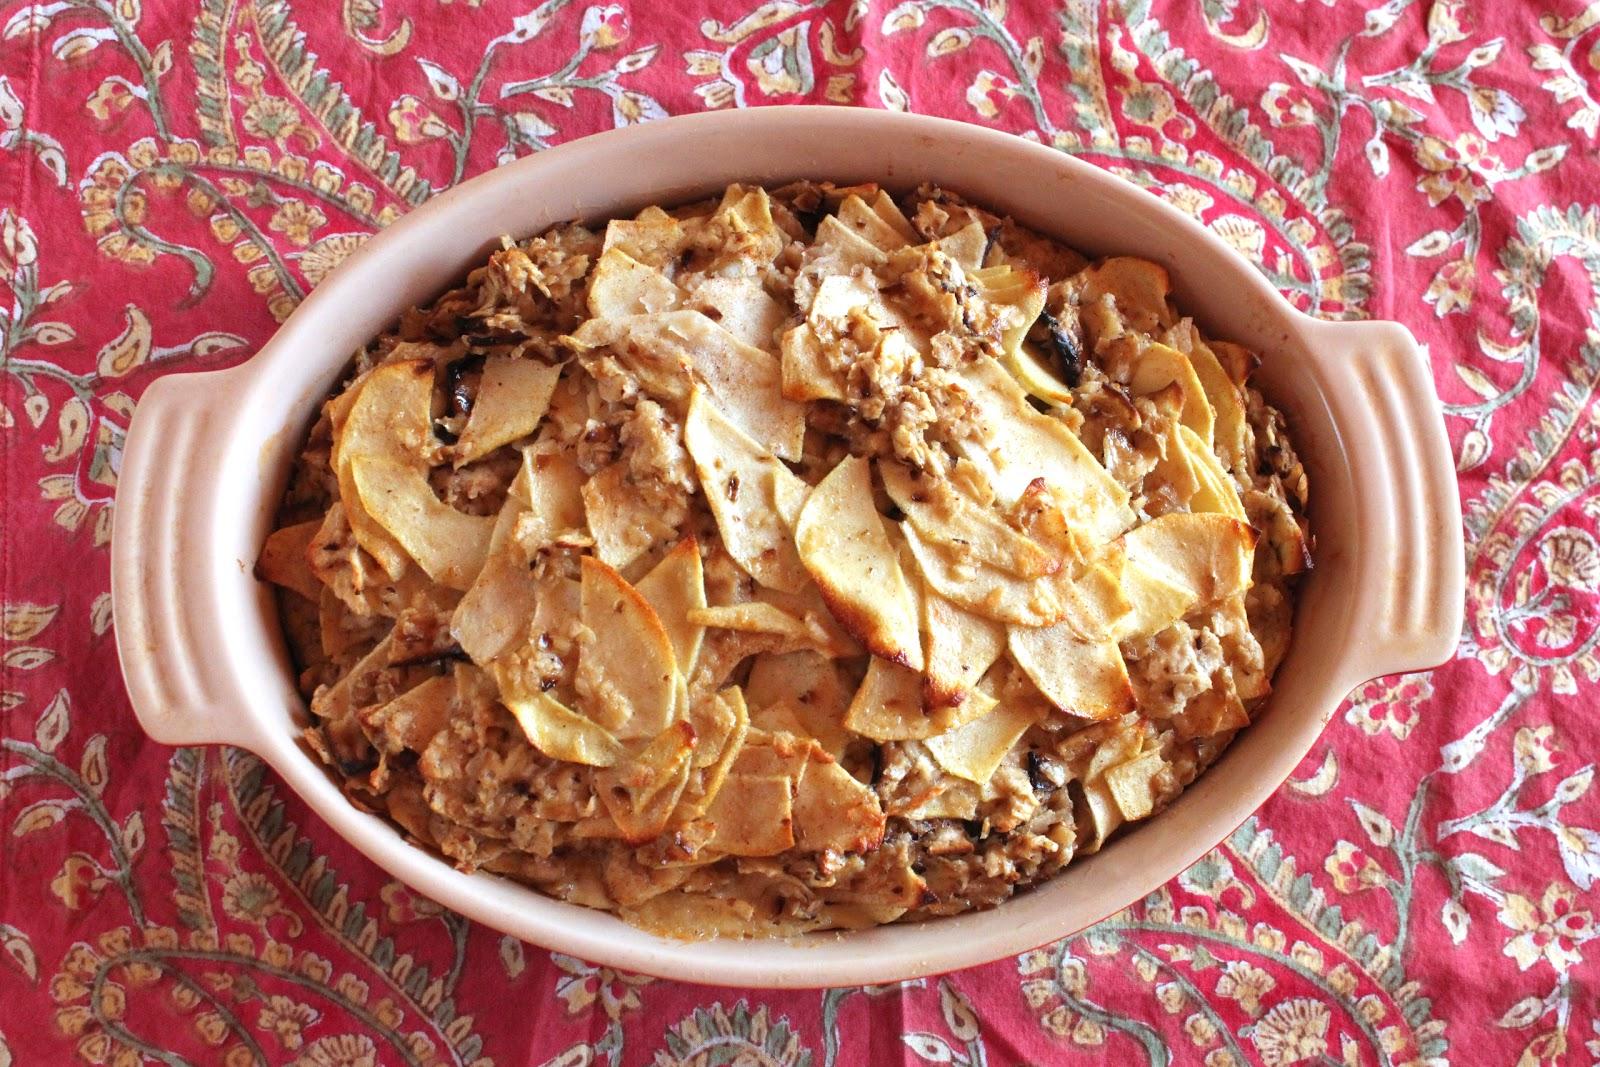 Passover dessert: Matzoh kugel with apples (pareve)